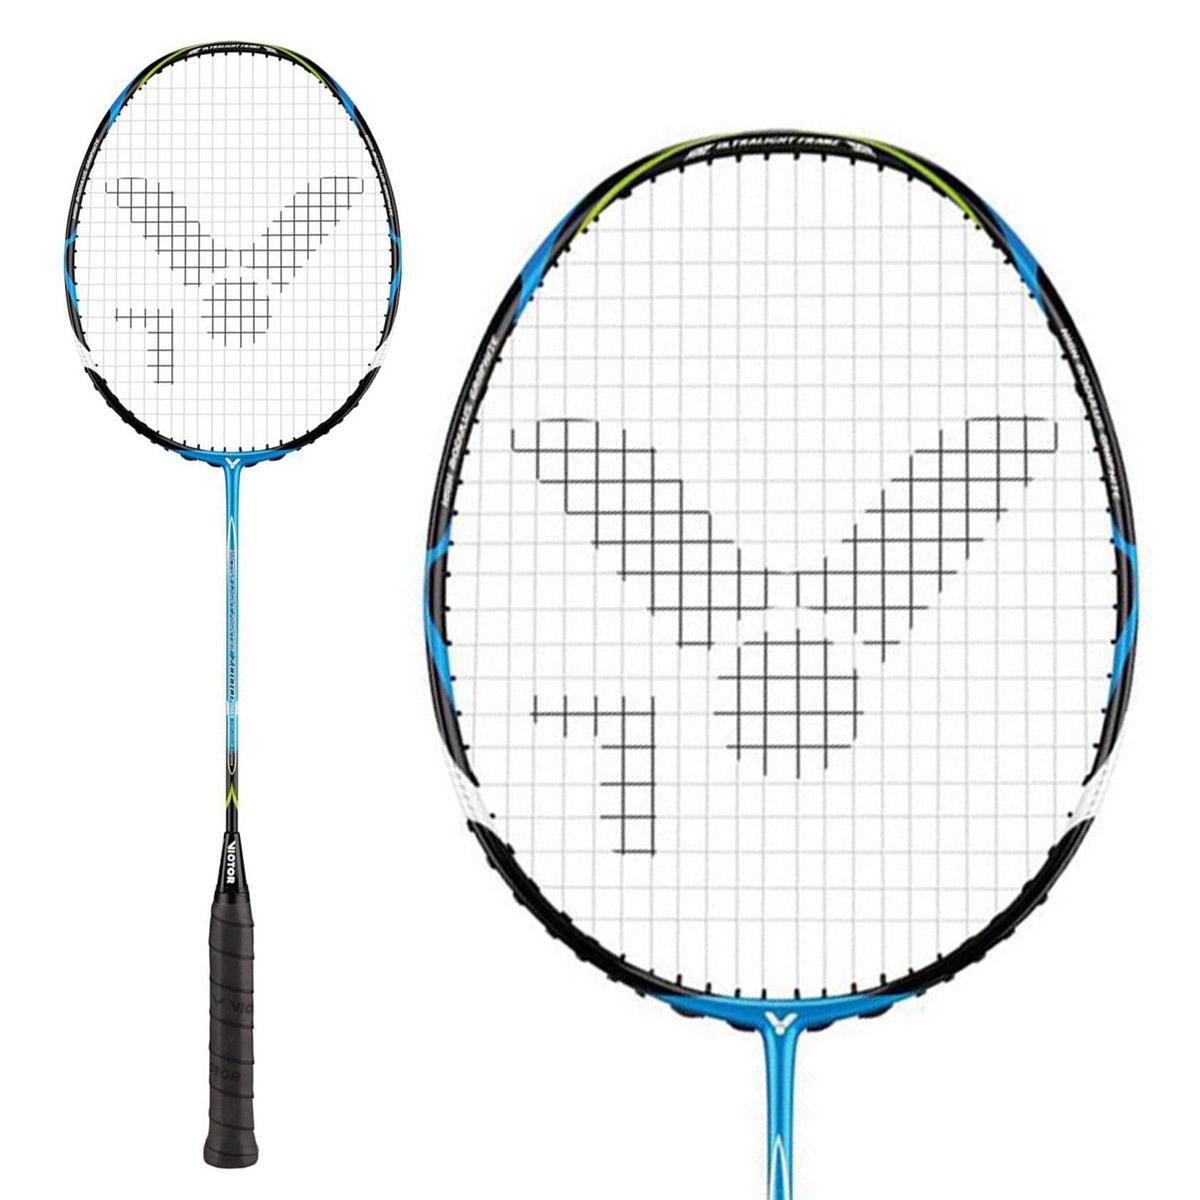 Victor Light Fighter 7000 Badminton Racket | Direct Badminton